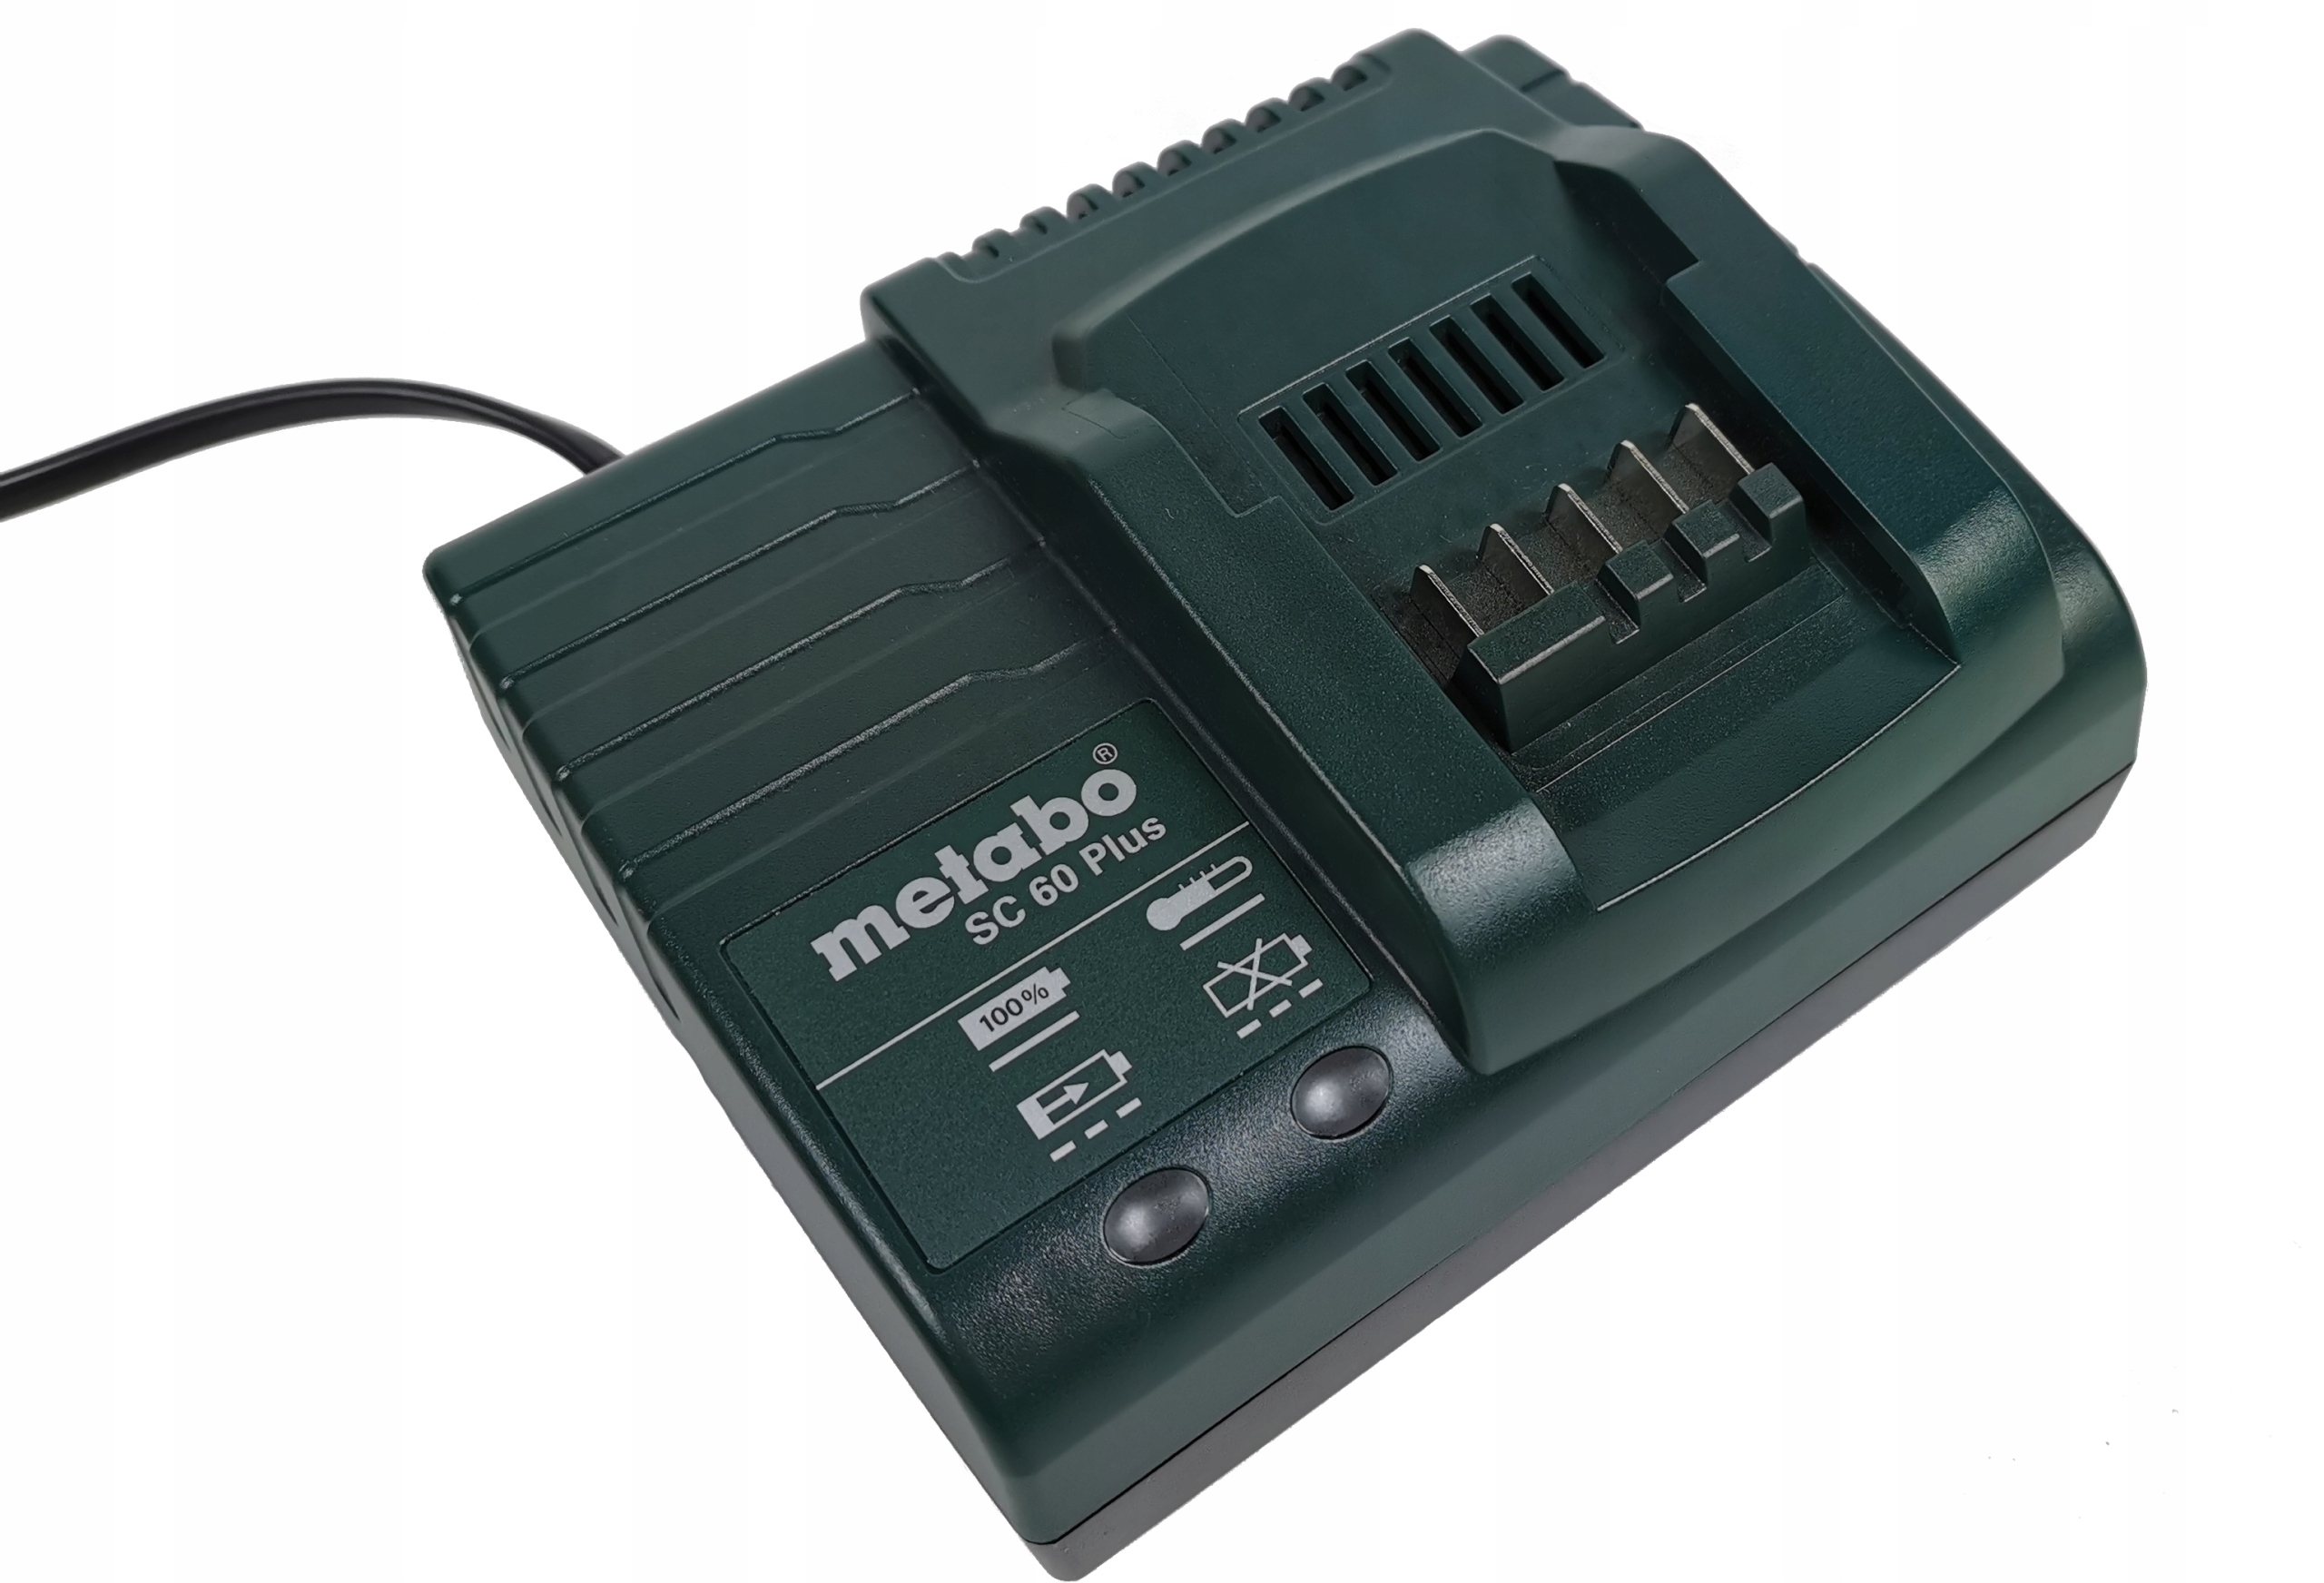 METABO SC 60 Plus ładowarka do aku 10,8 - 18V 1,5A